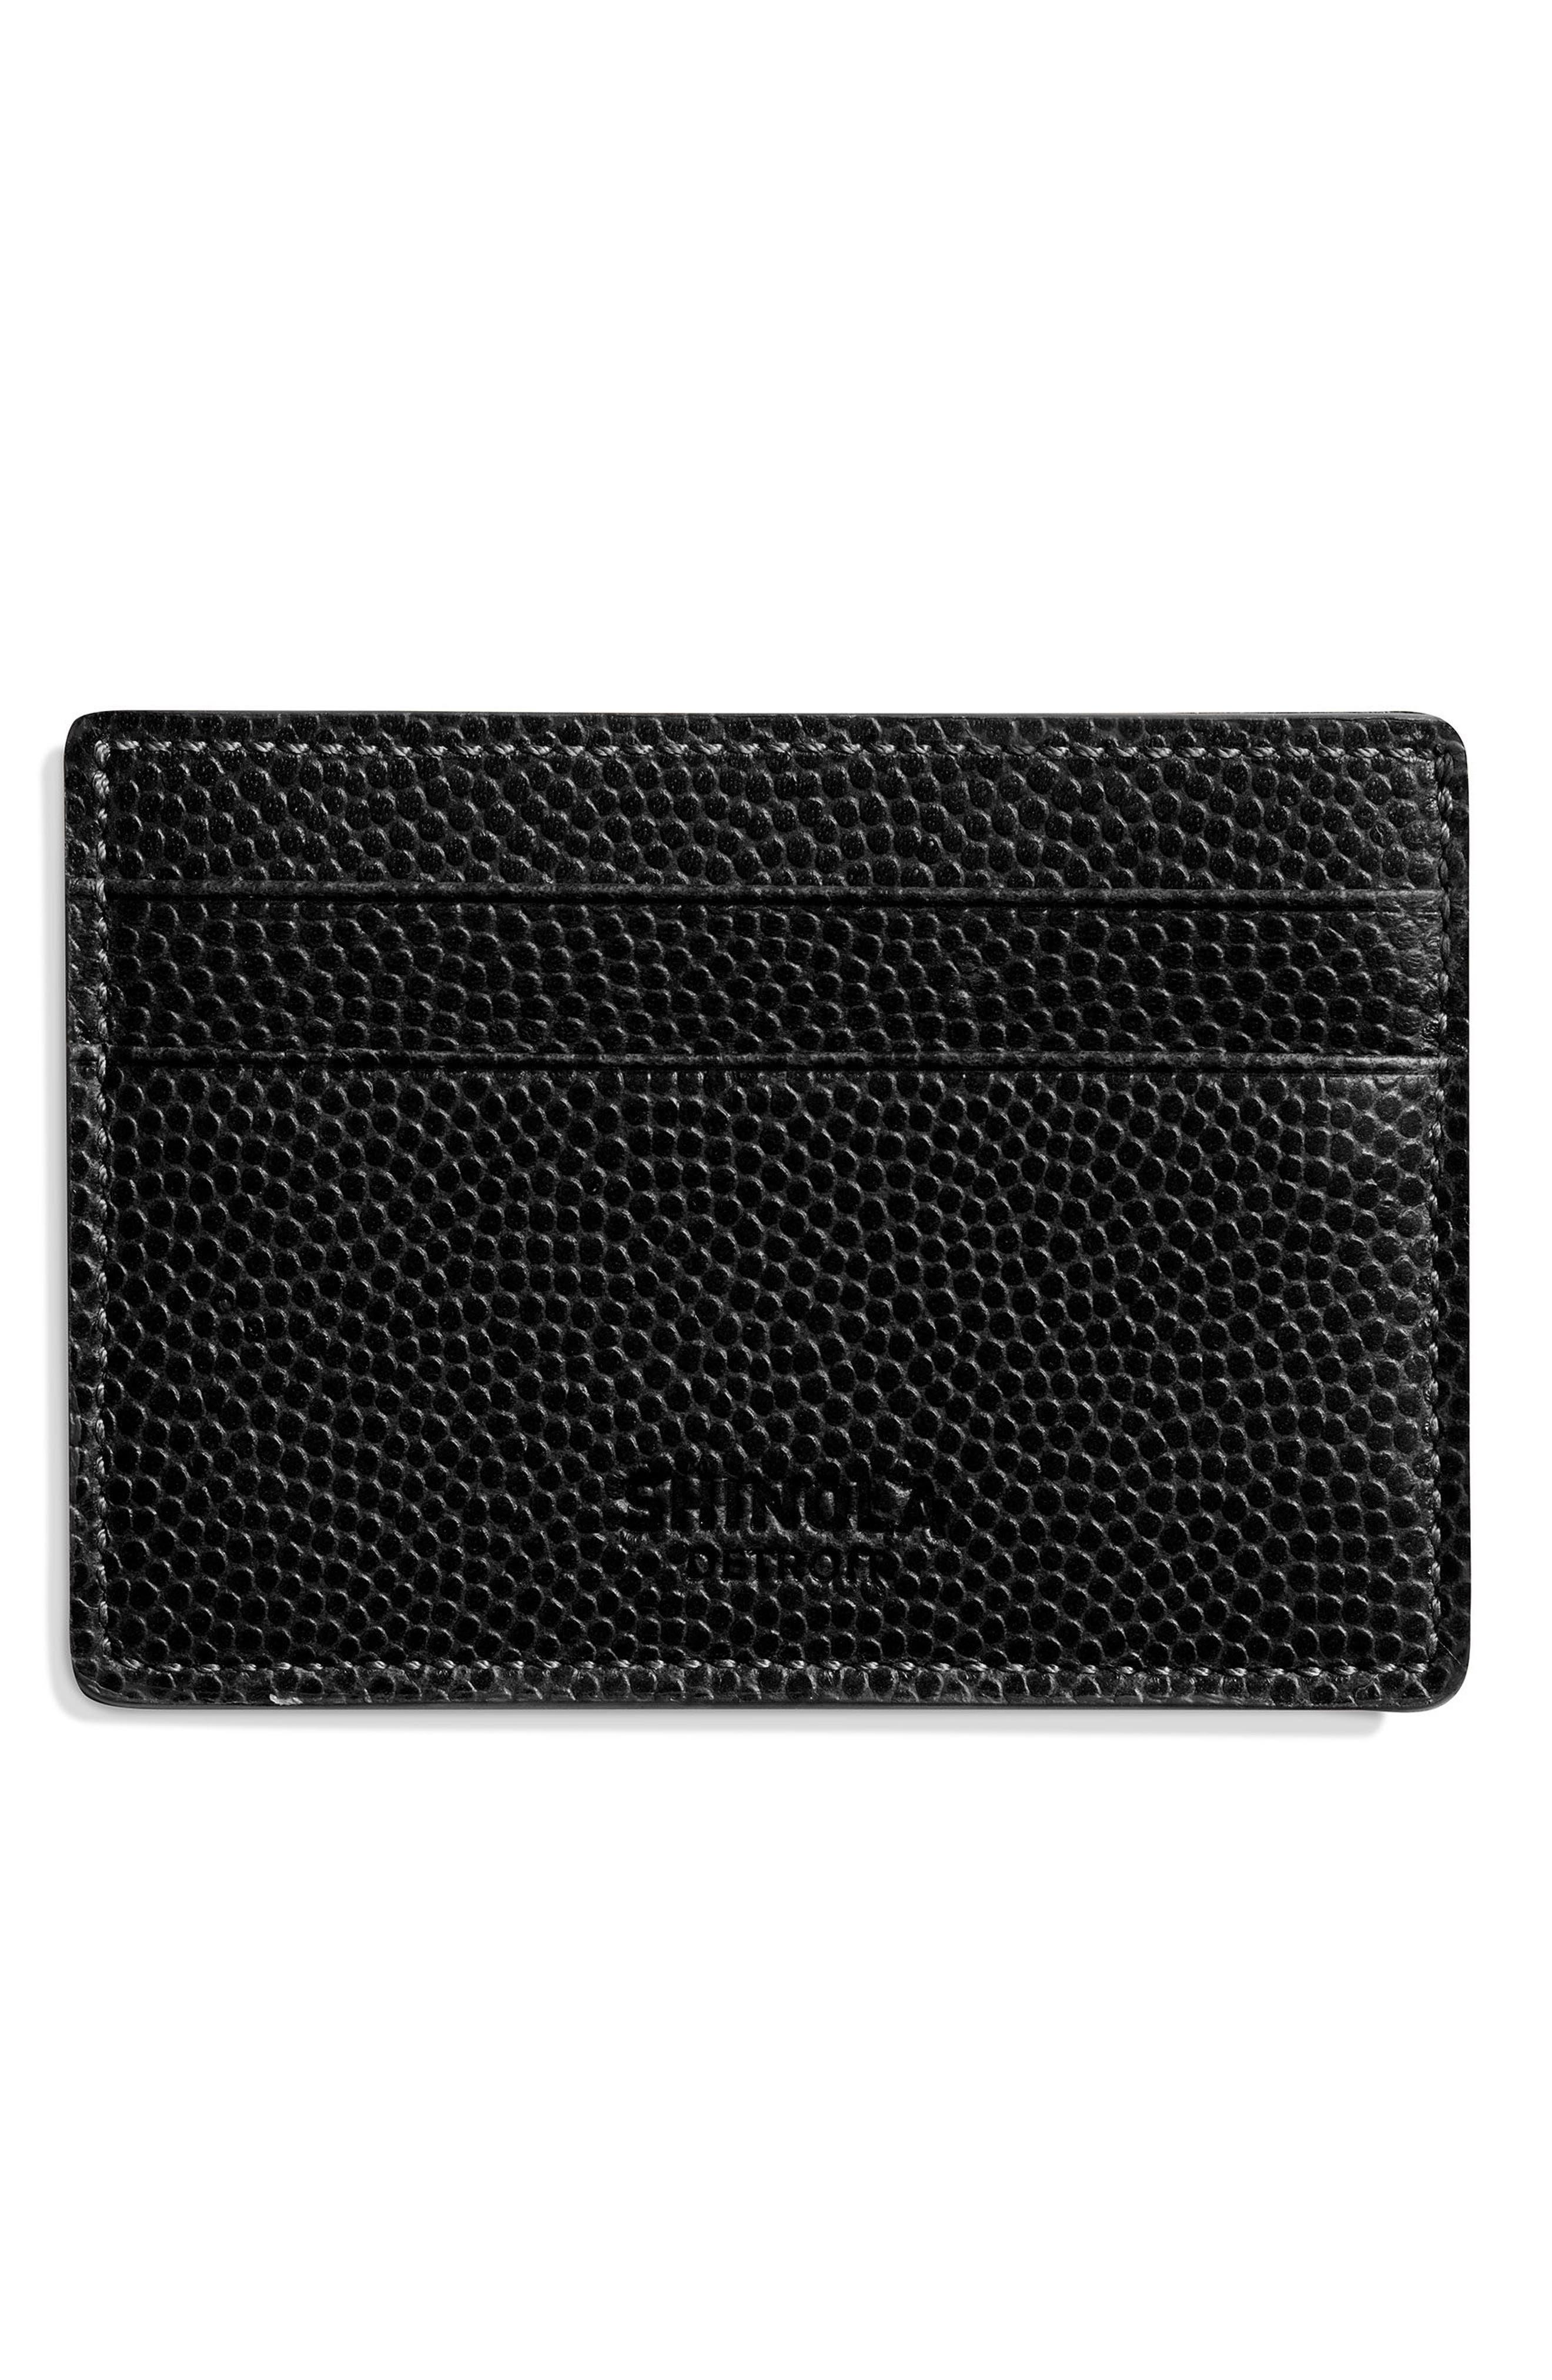 Alternate Image 2  - Shinola Latigo Leather Card Case